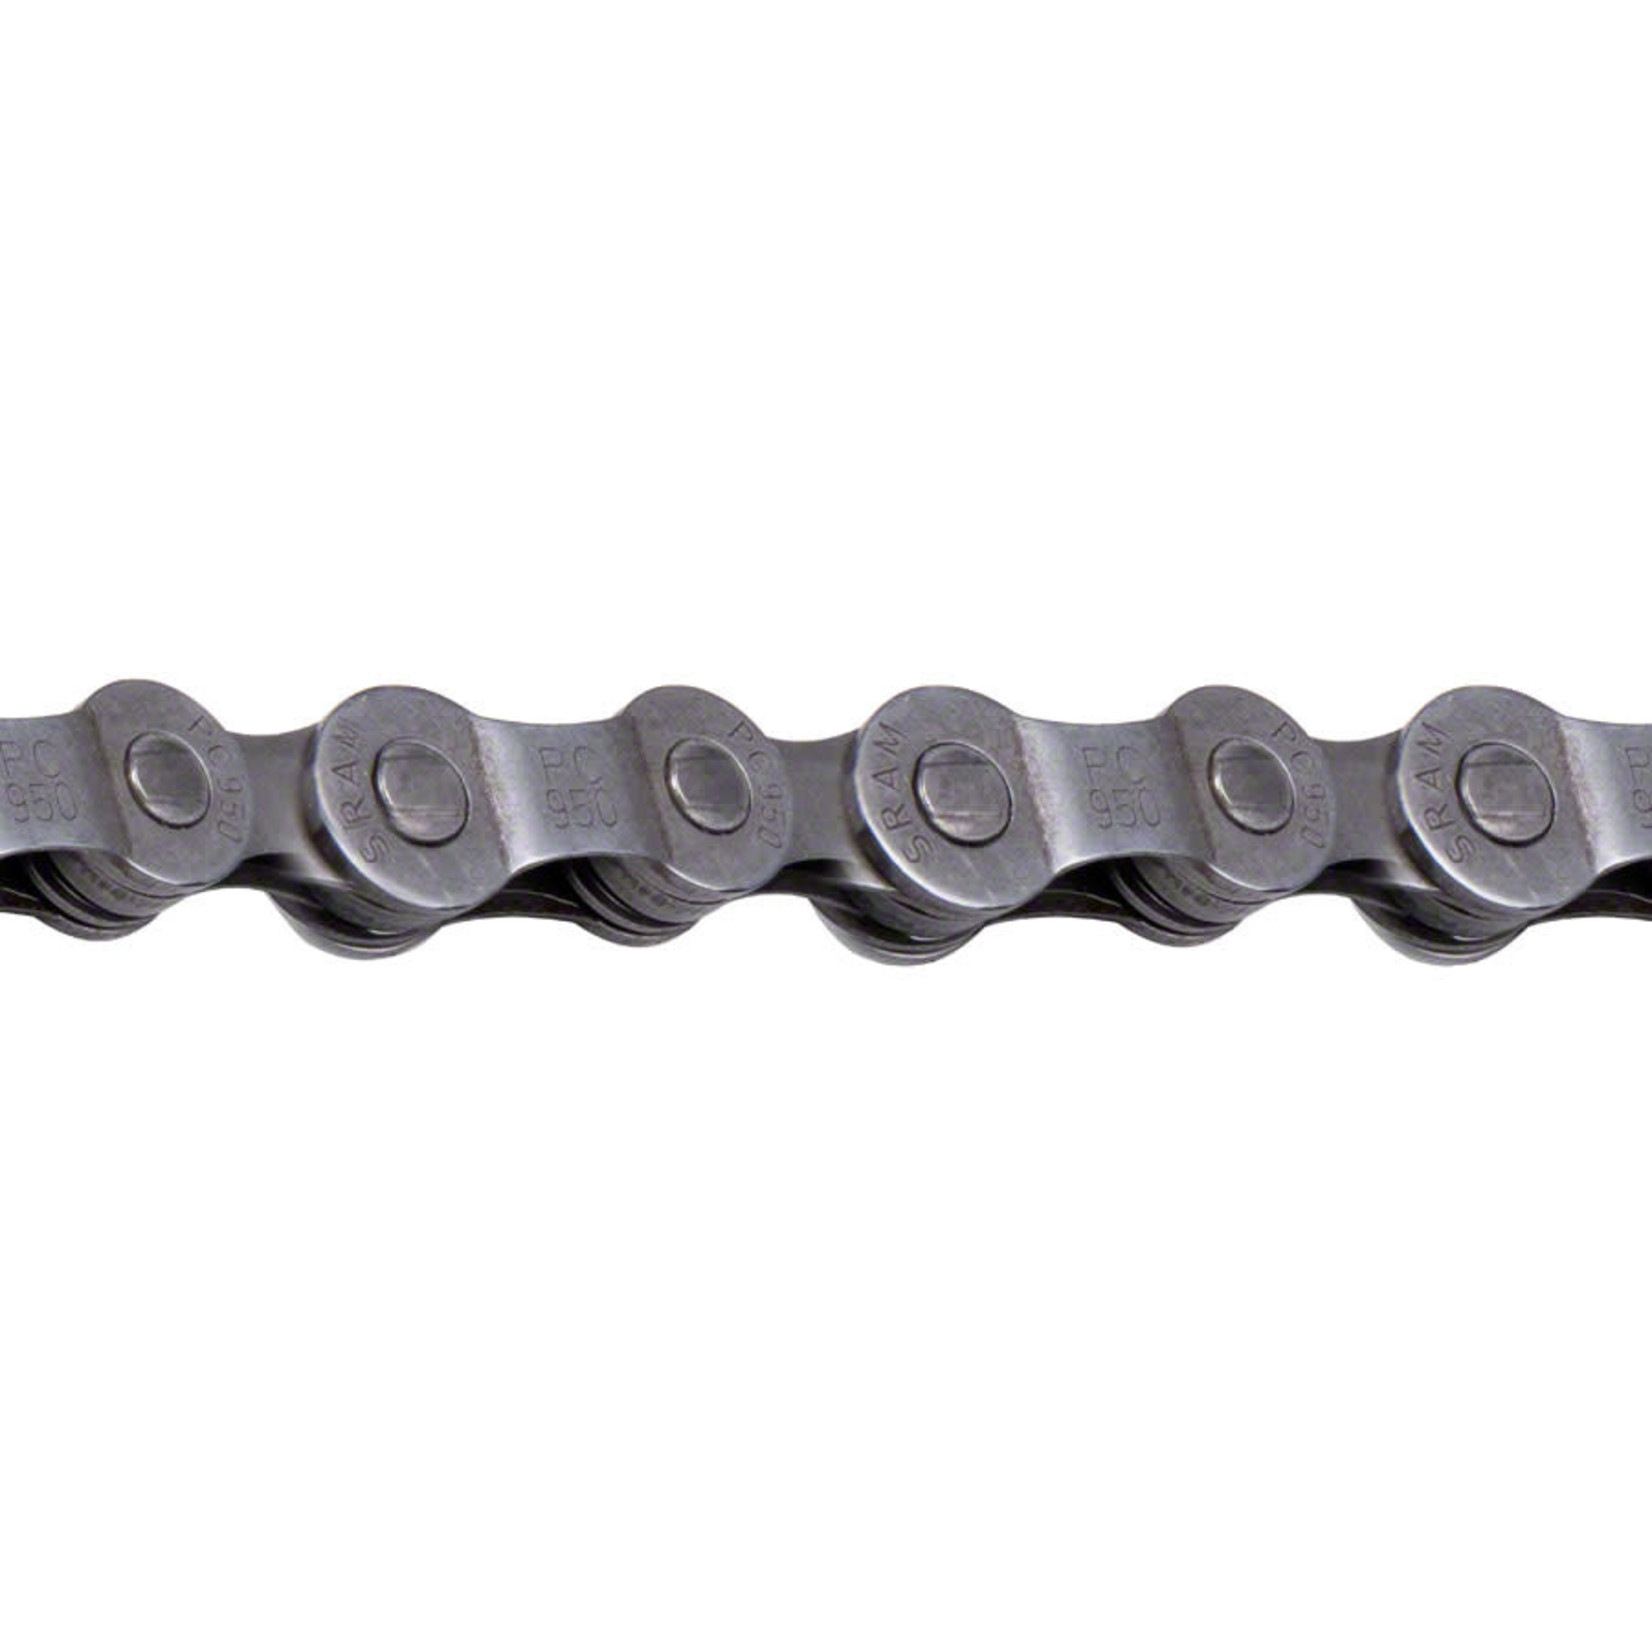 SRAM SRAM Bulk PC850 6/7/8 speed chain Sil/Gry single